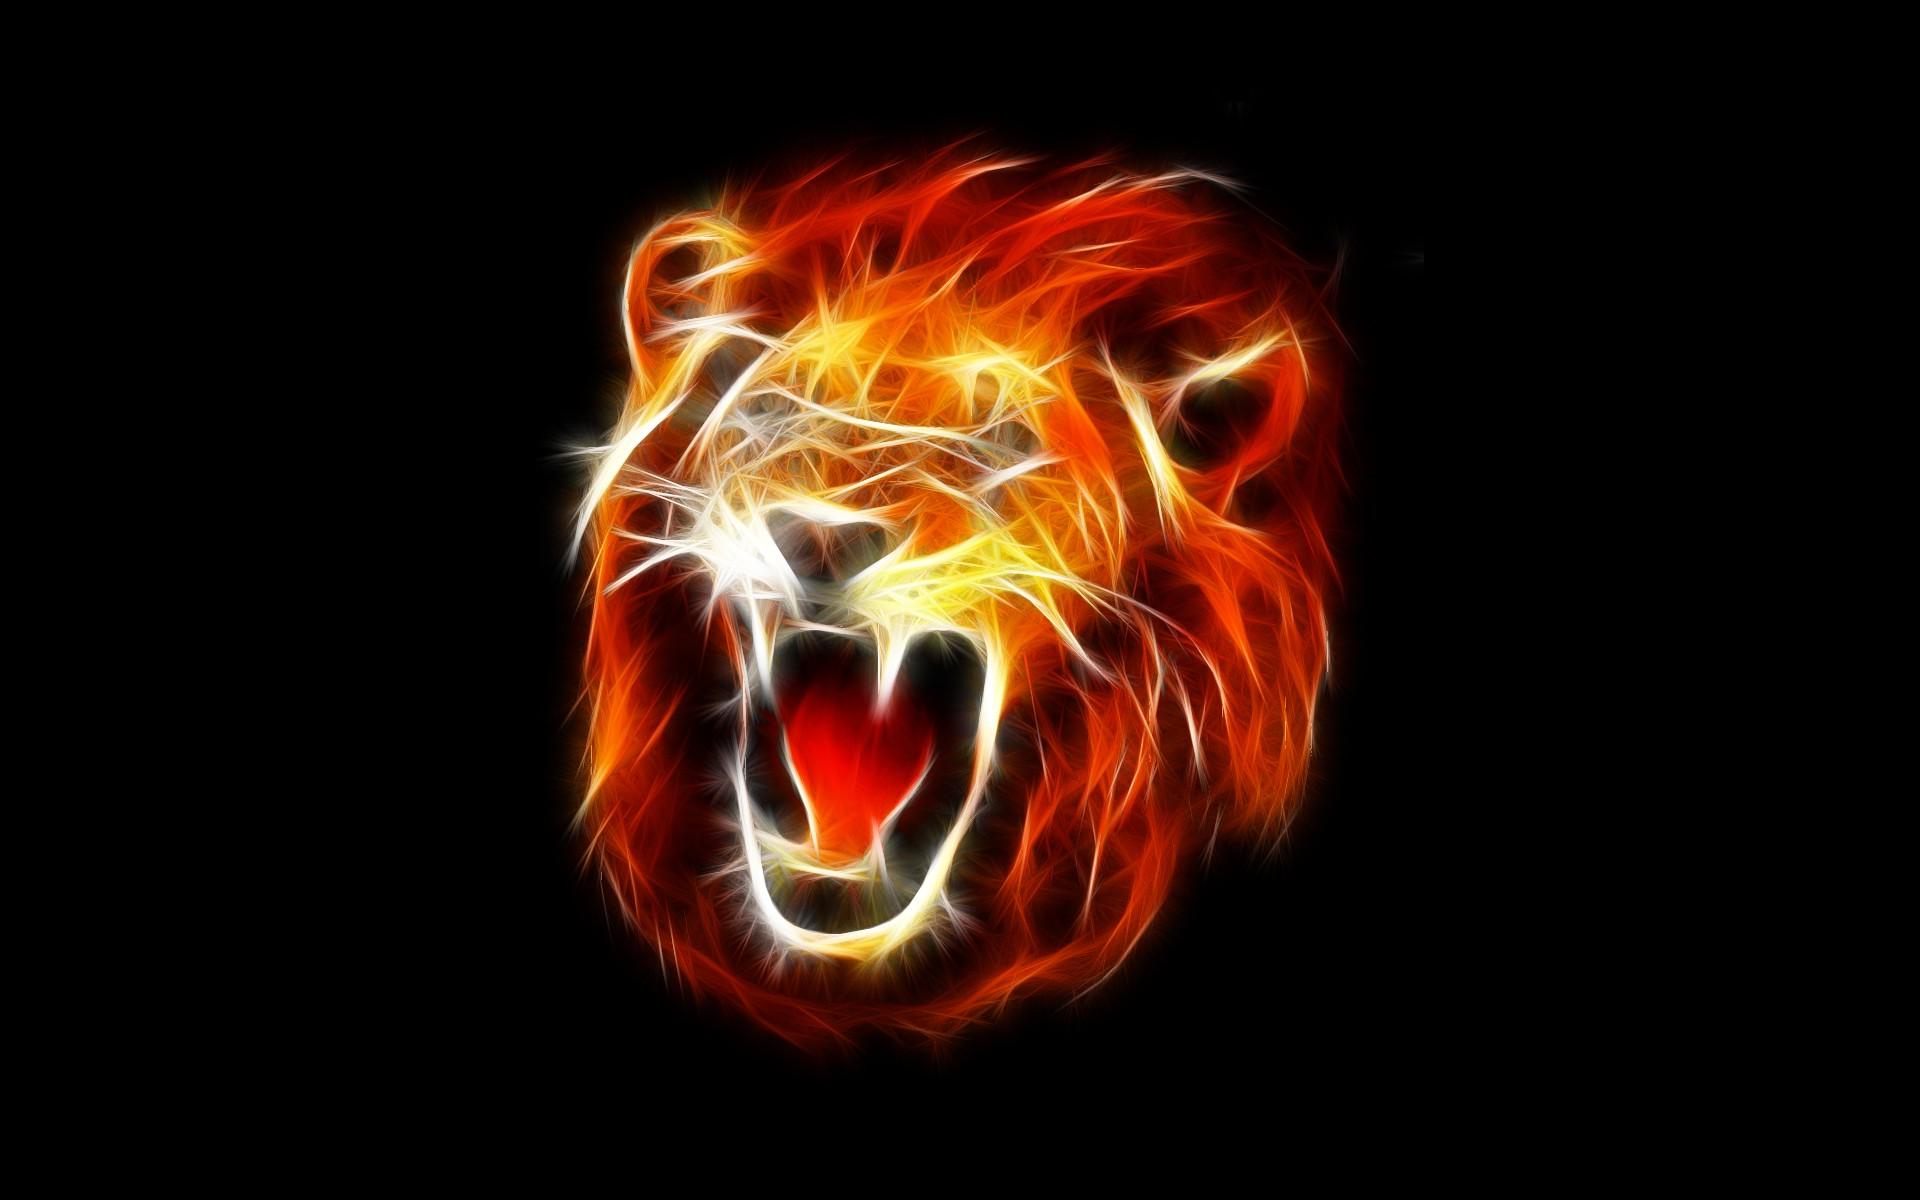 Abstract Lion Fire Big Cats Roar Flame Darkness Graphics 1920x1200 Px Computer Wallpaper Fractal Art Font